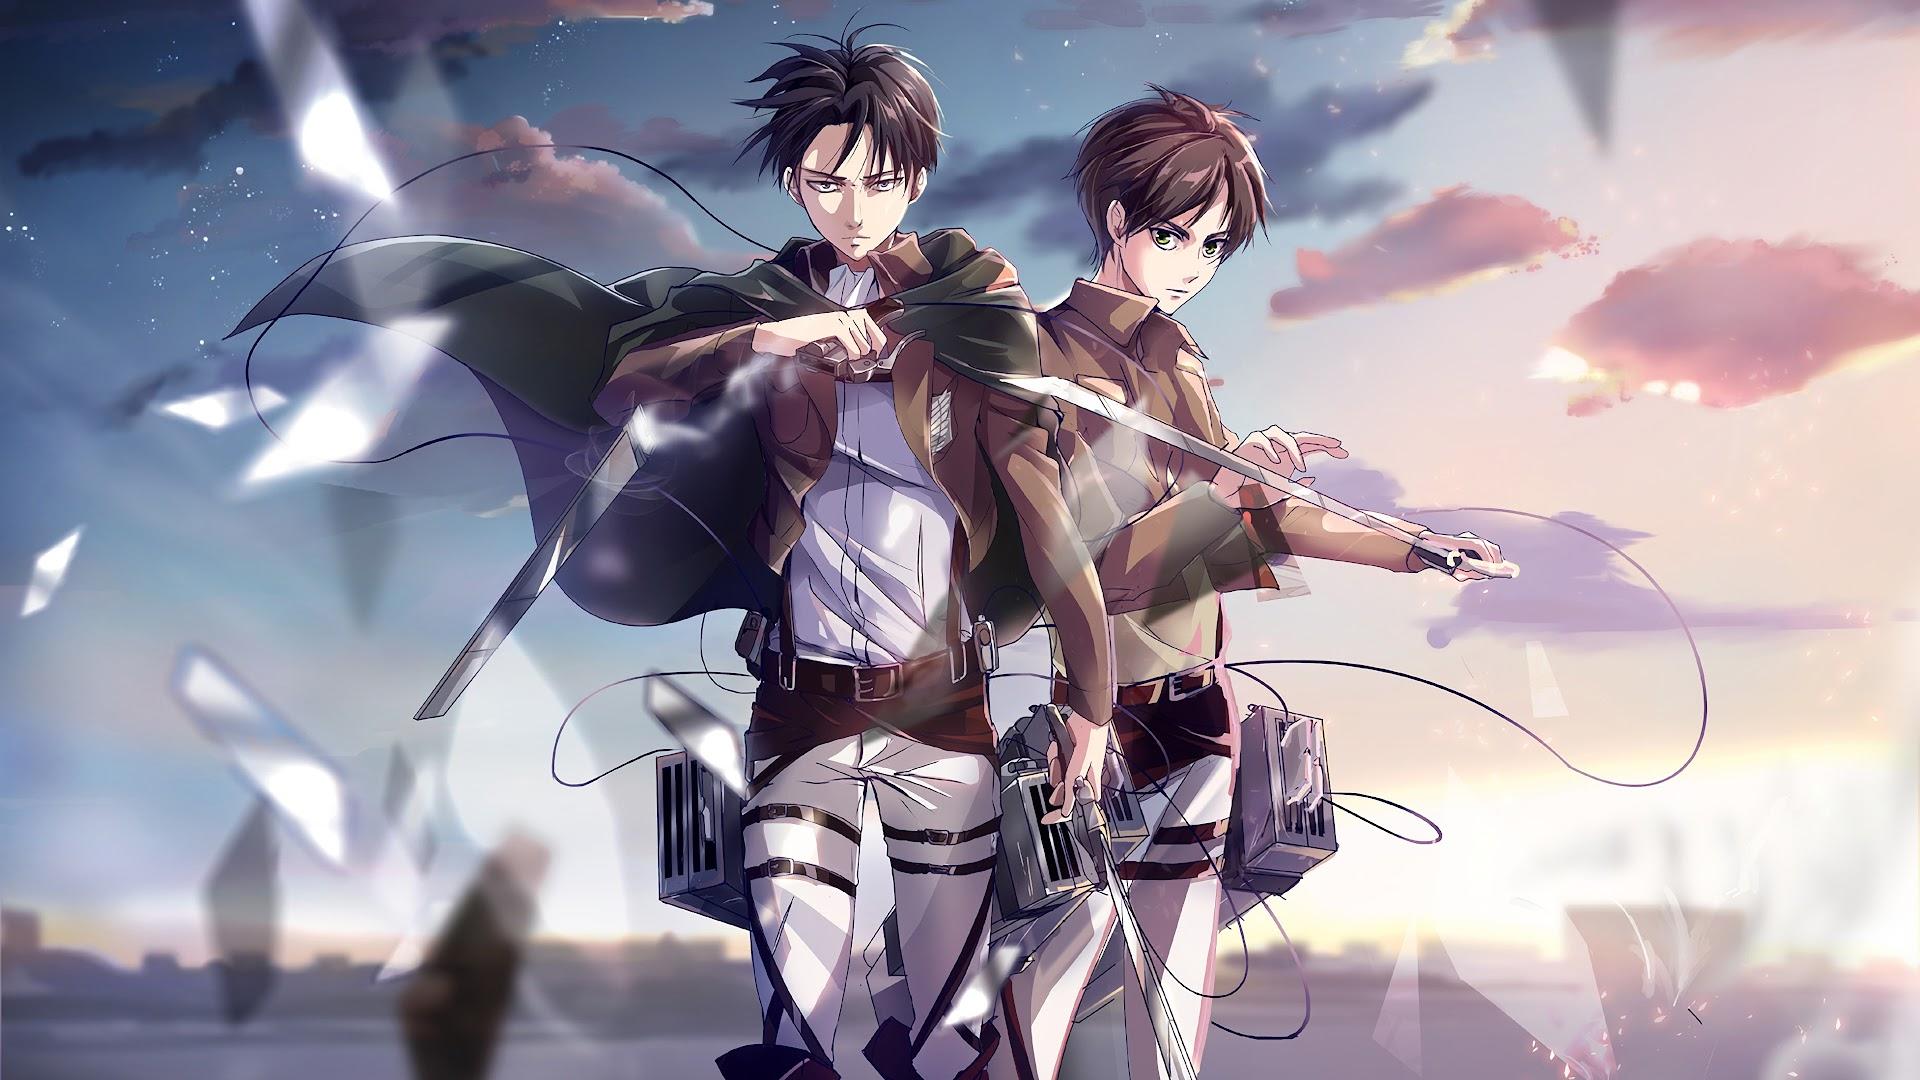 Levi And Eren Attack On Titan 4k Wallpaper 126